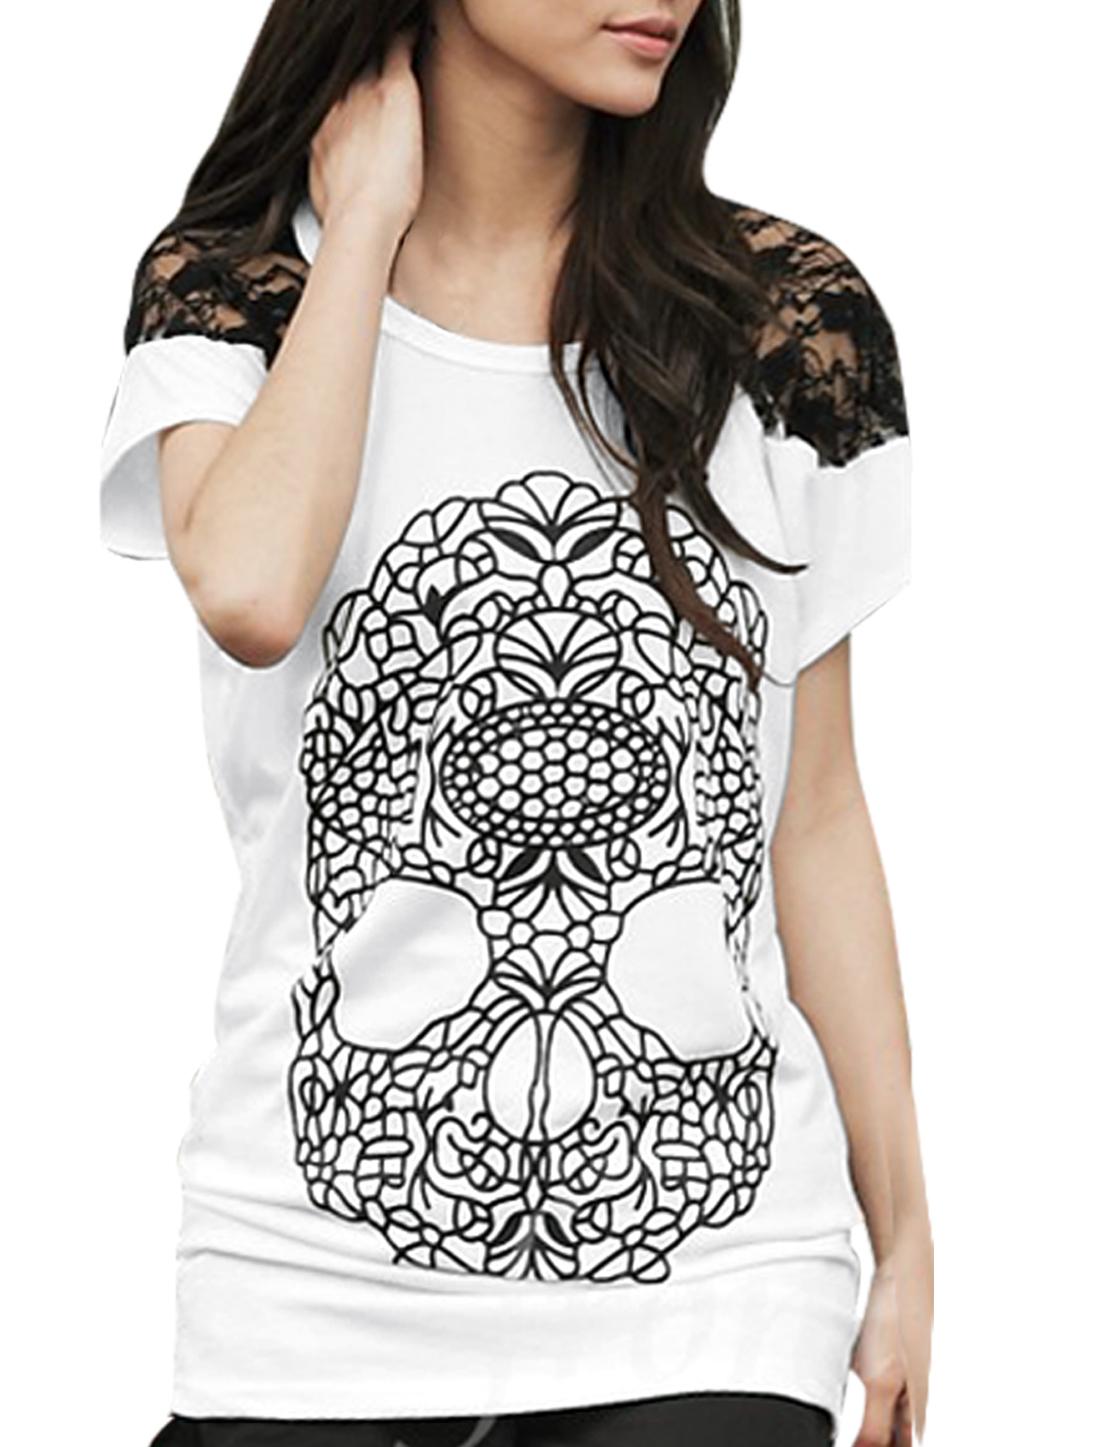 Ladies Chic Scoop Neck Short Raglan Sleeve Lace Splice White T-Shirt XS